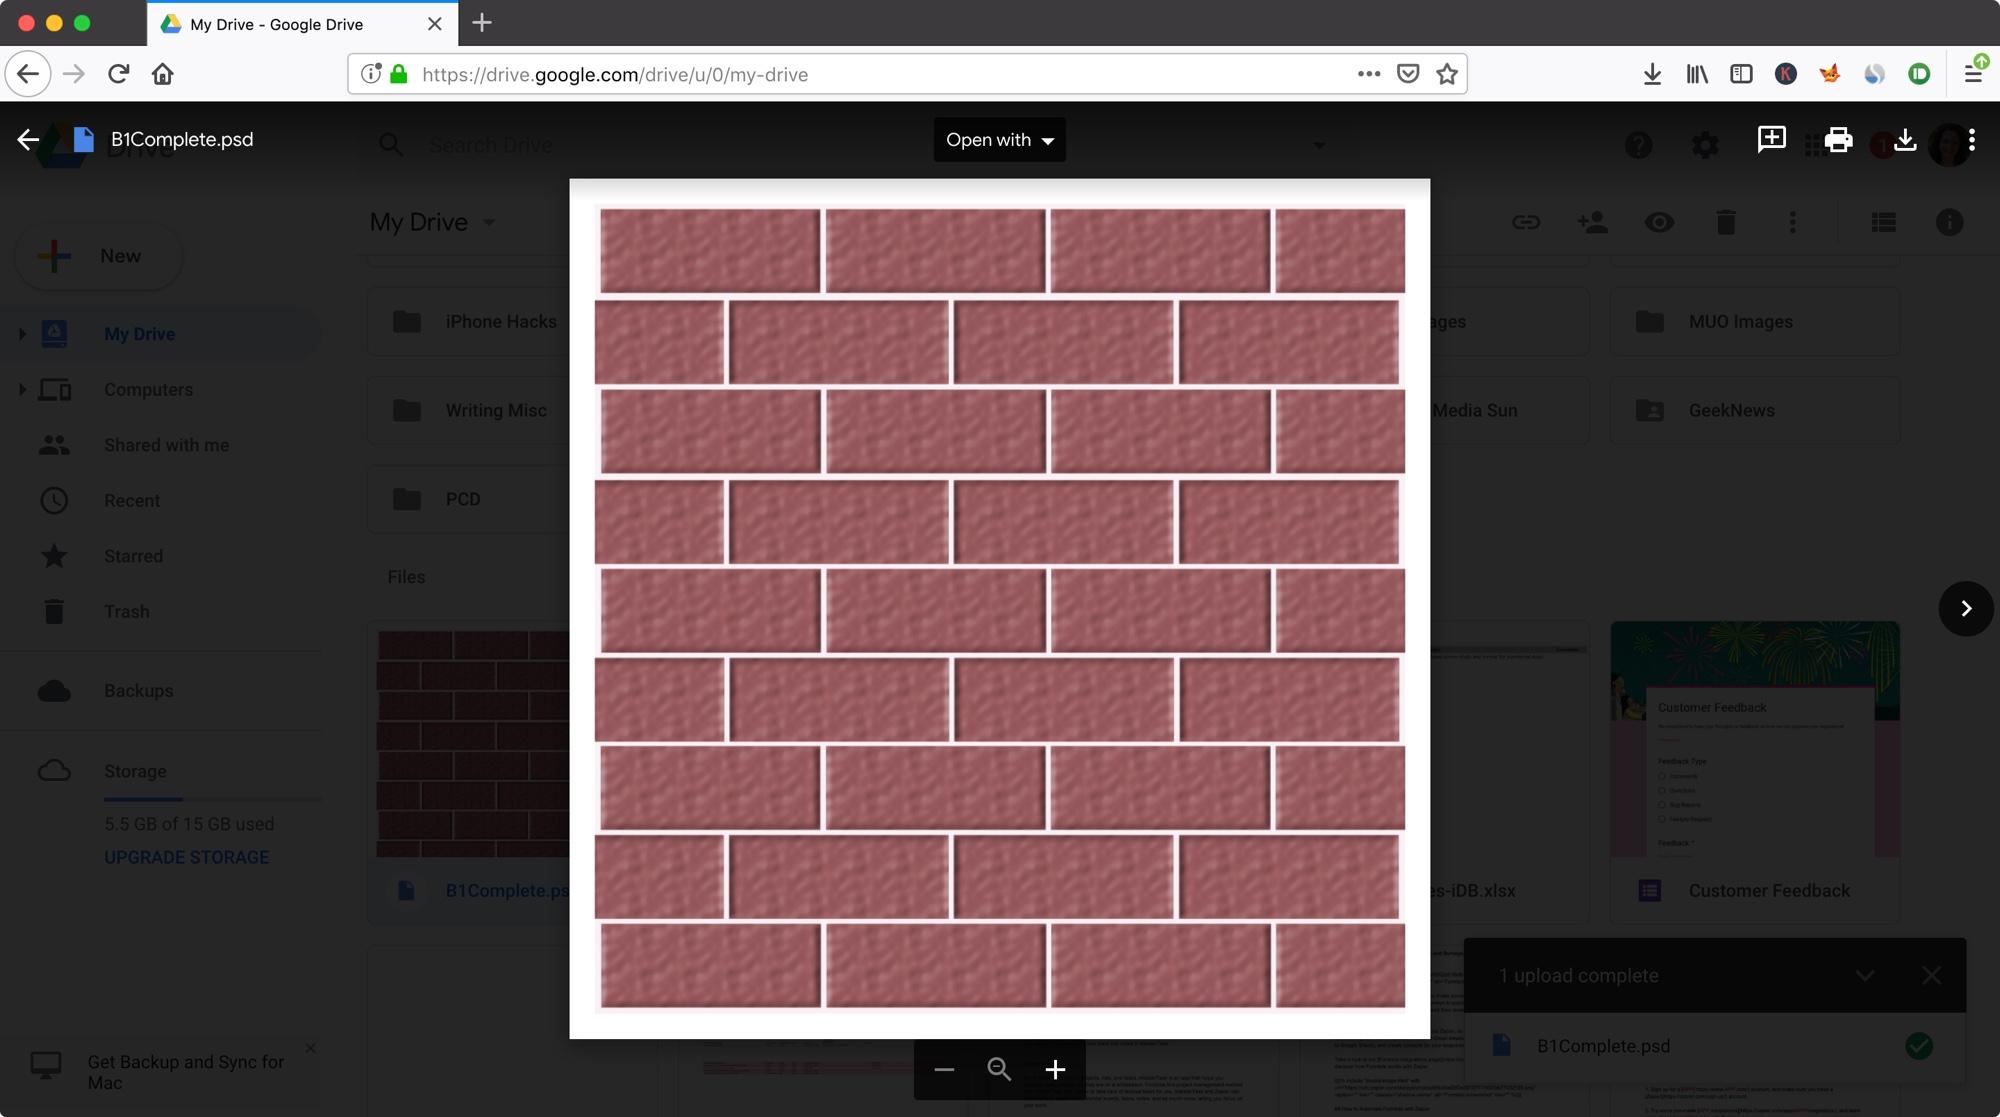 Google Drive View PSD files on Mac